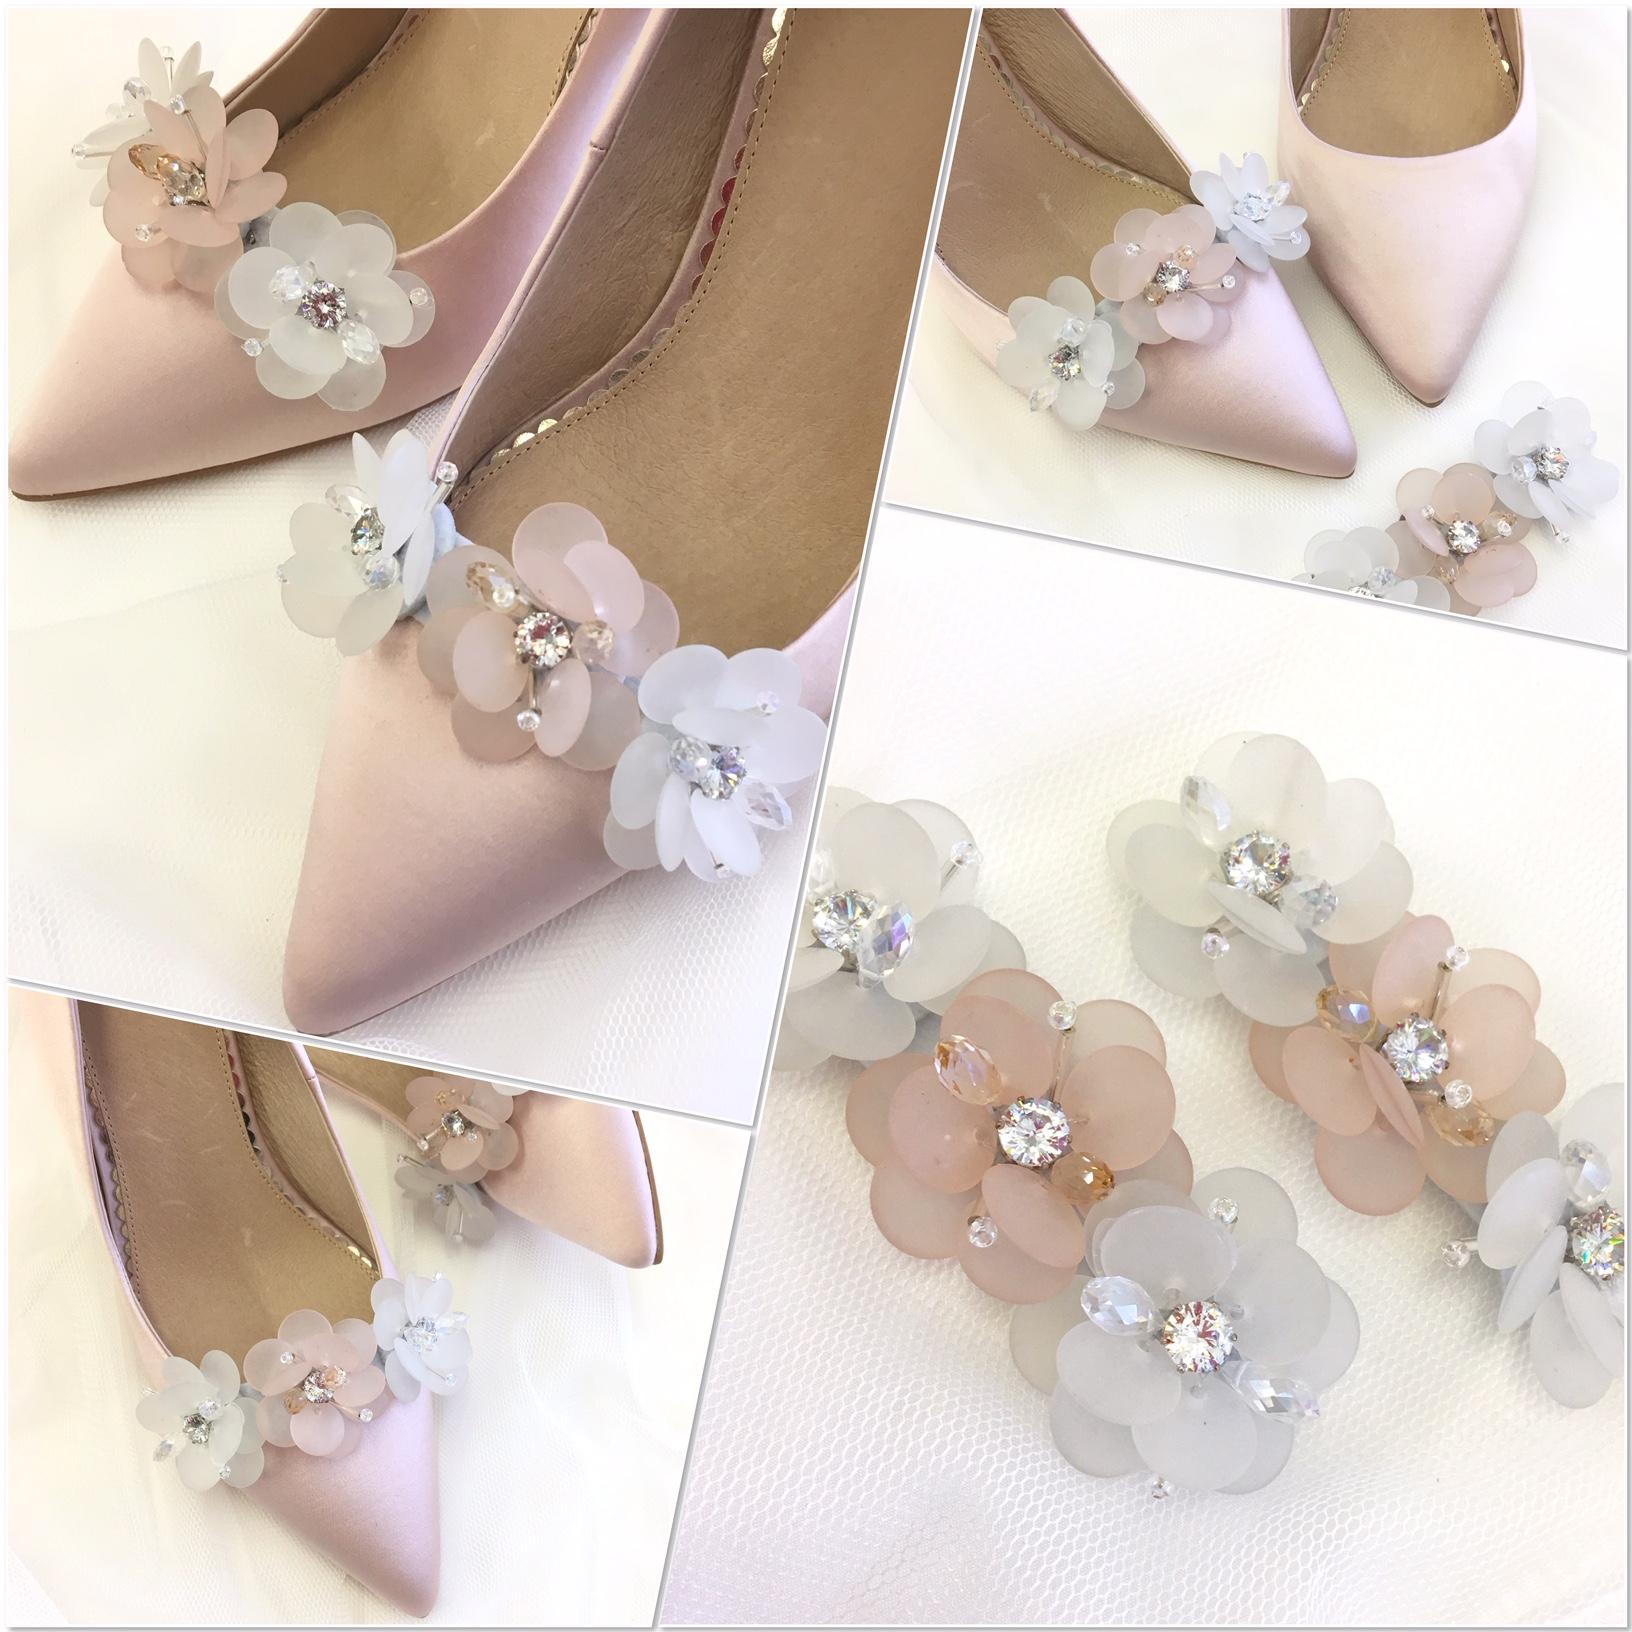 Damson shoe clips